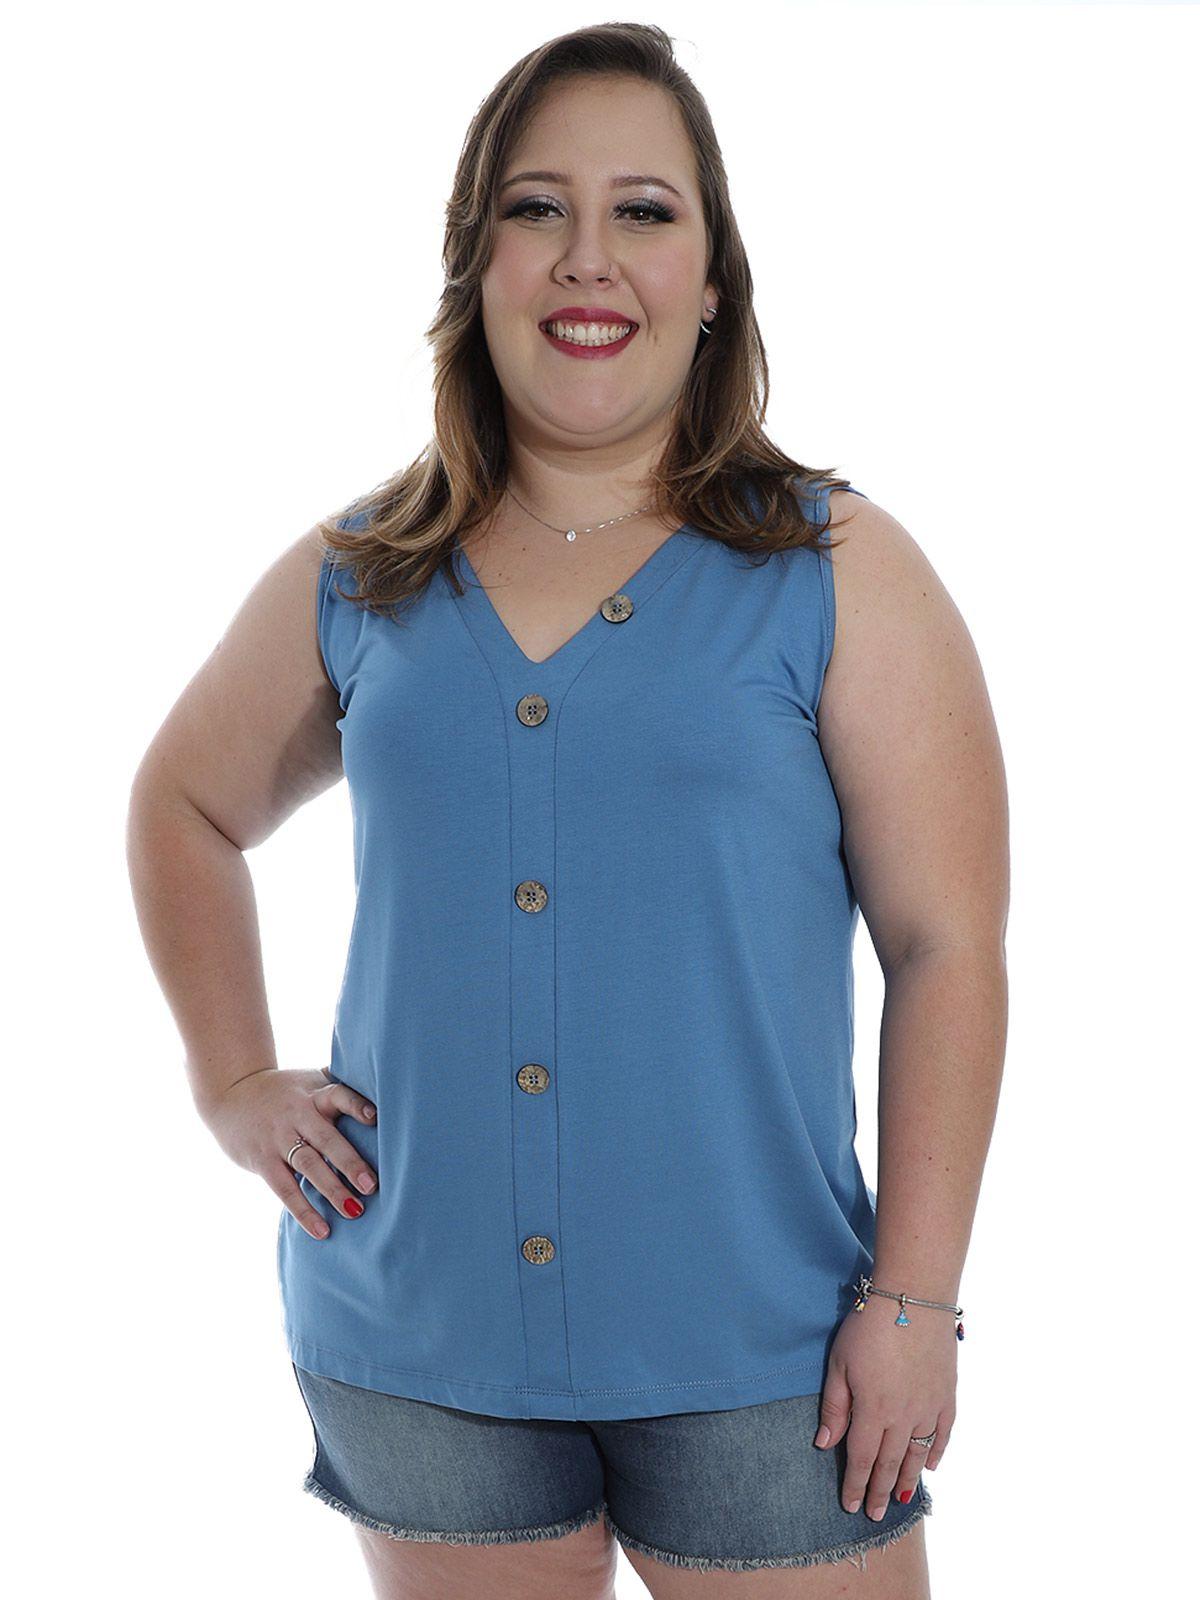 Regata Plus Size KTS Viscolycra com Botões Azul